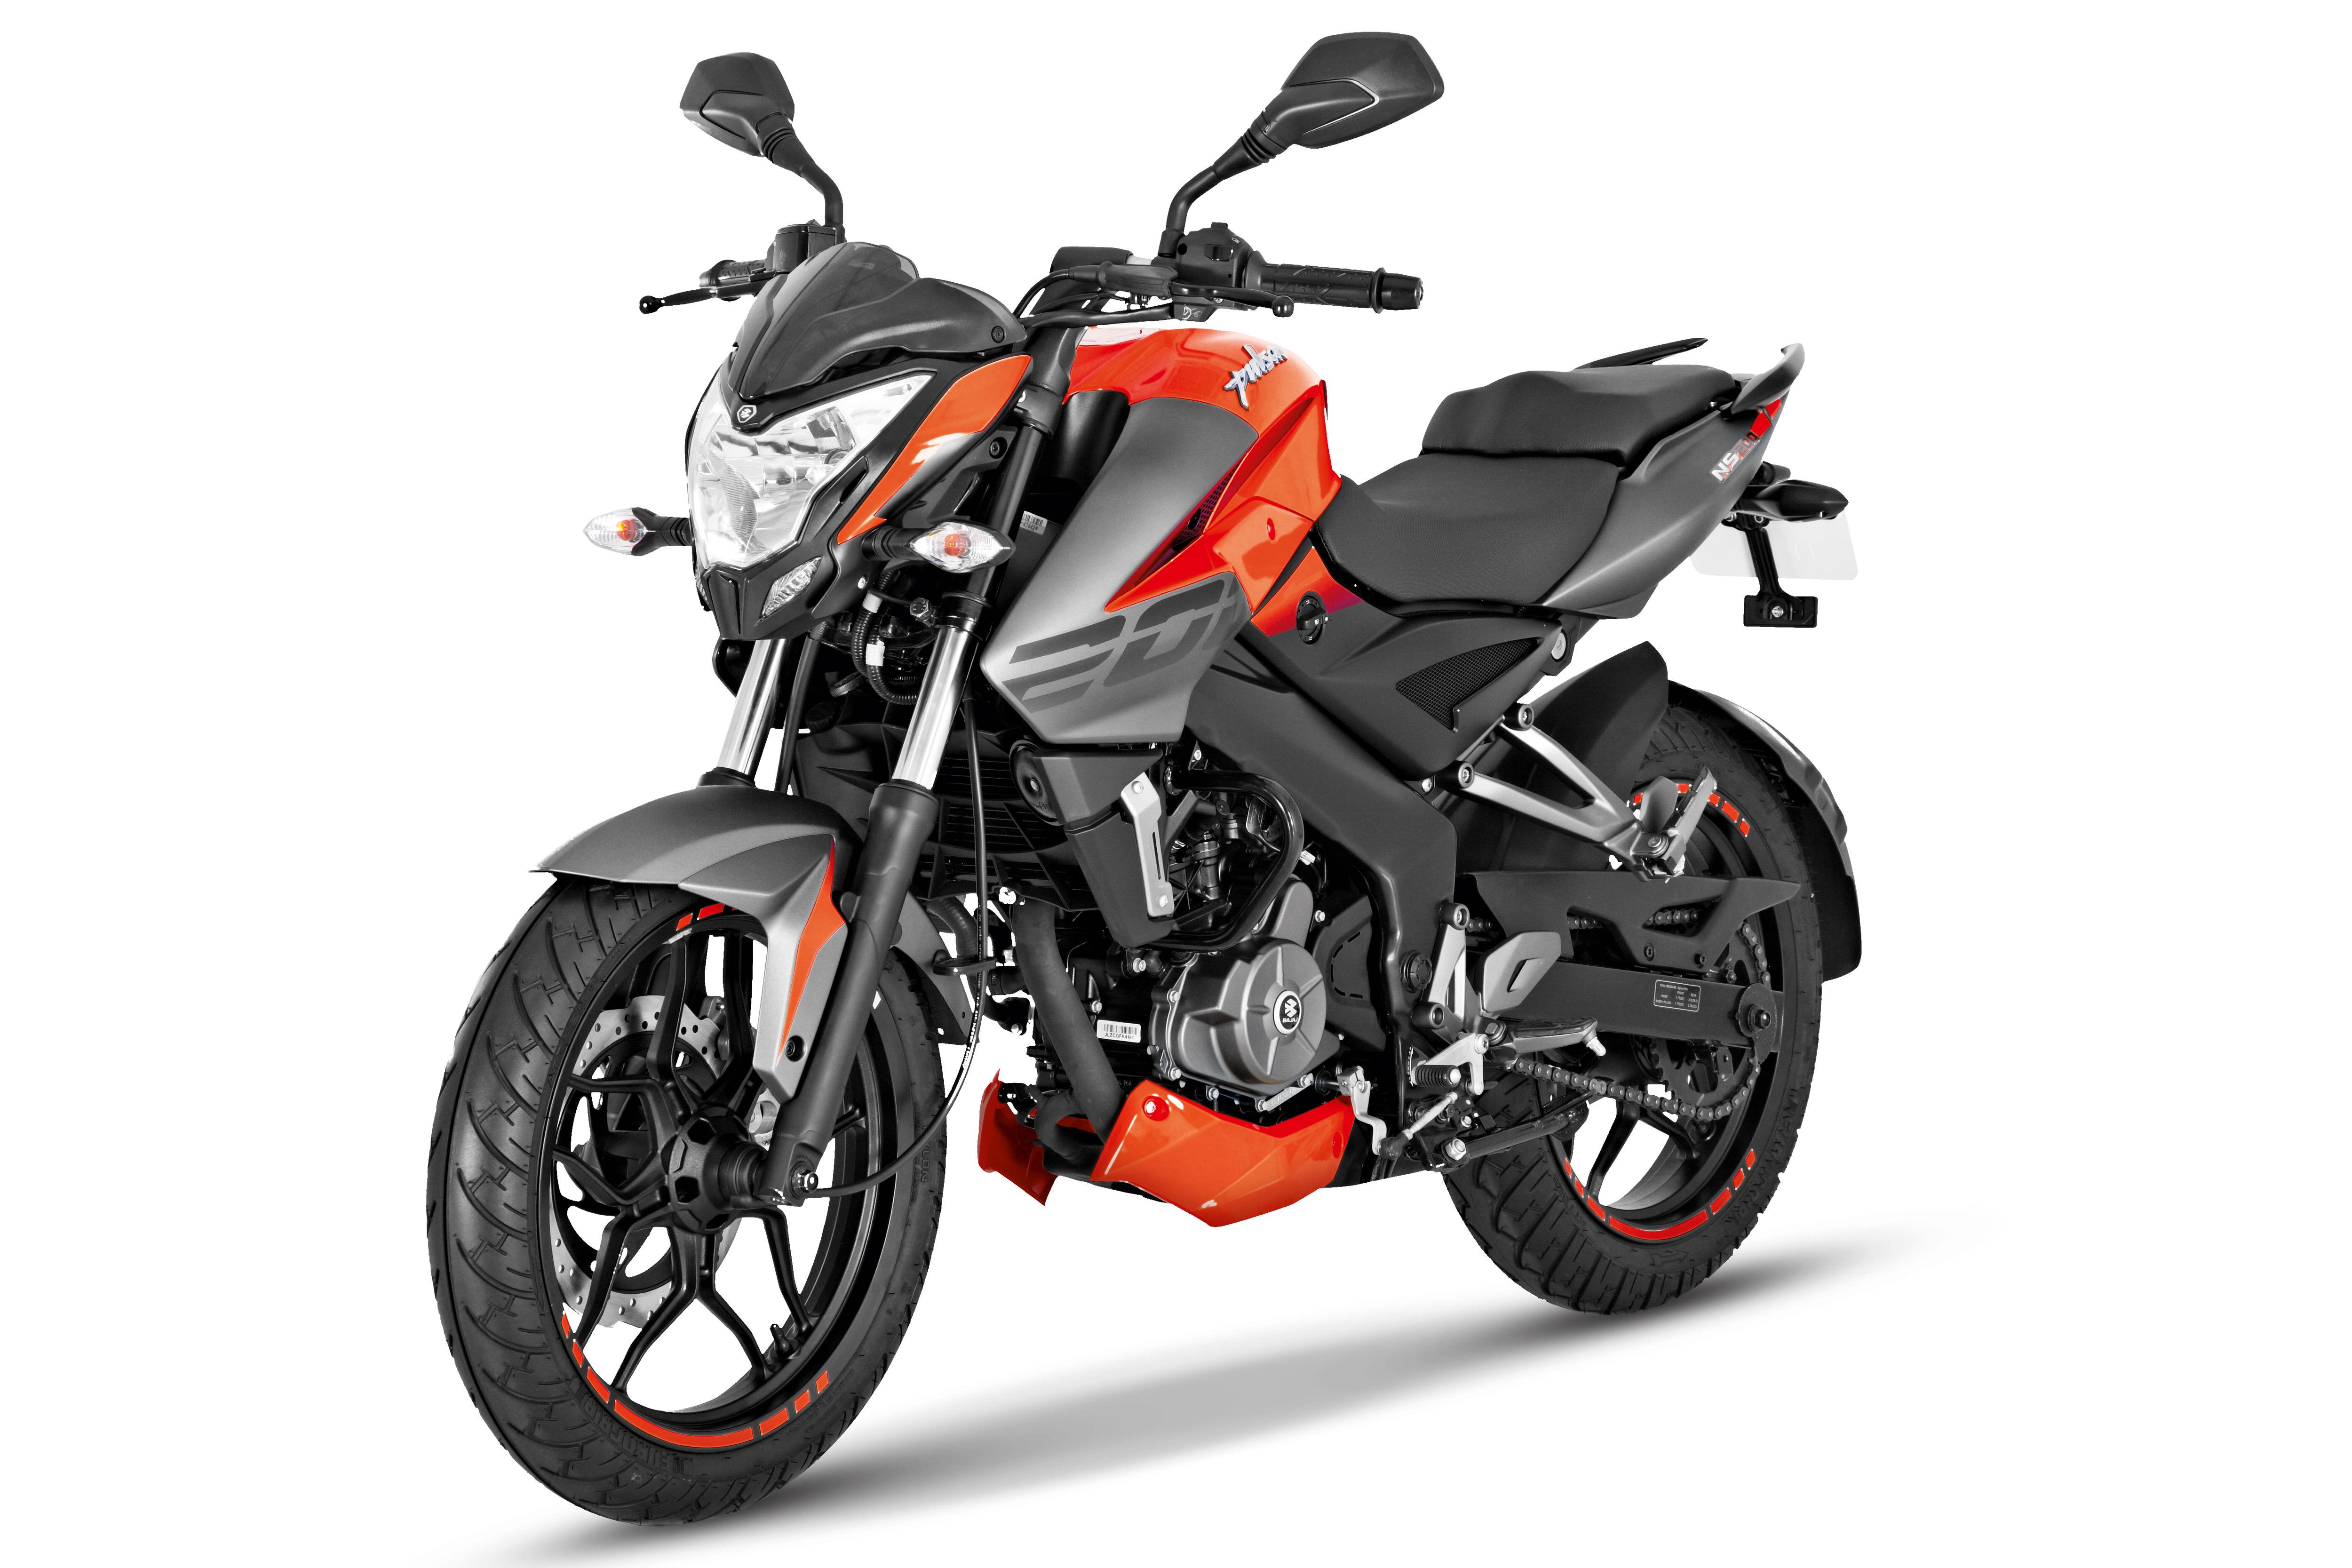 Motocicleta Pulsar Ns200 Bajaj | SEARS.COM.MX - Me entiende!